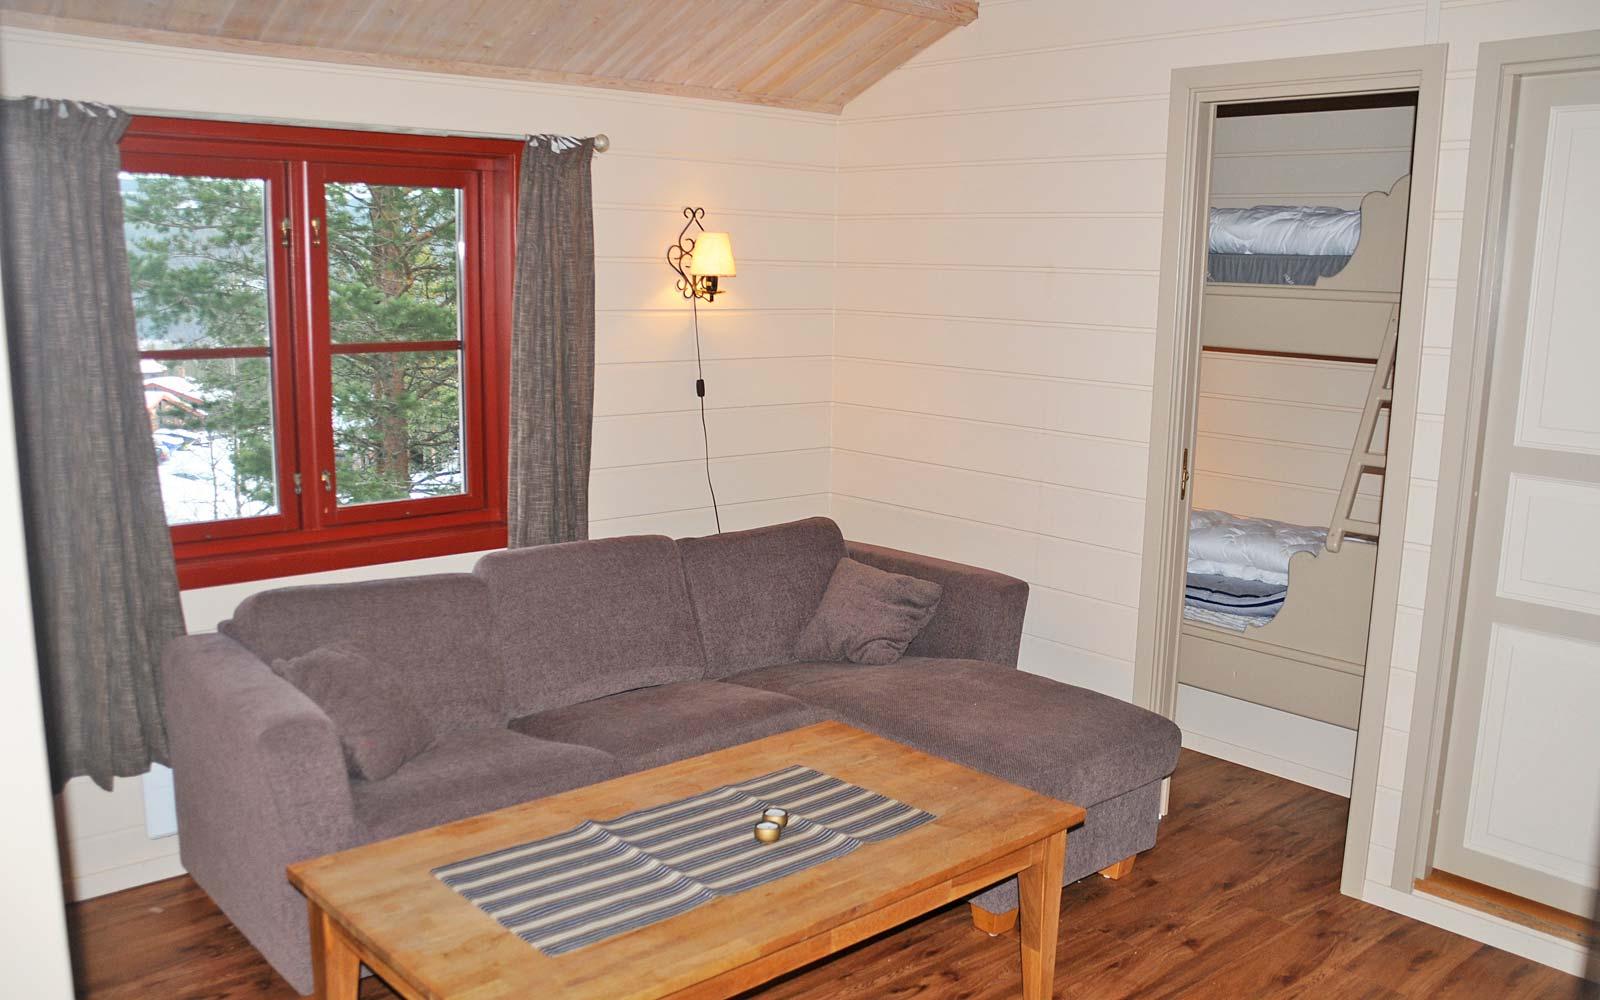 Stue leilighet Kvilsten - Sjumilskogen booking Trysil